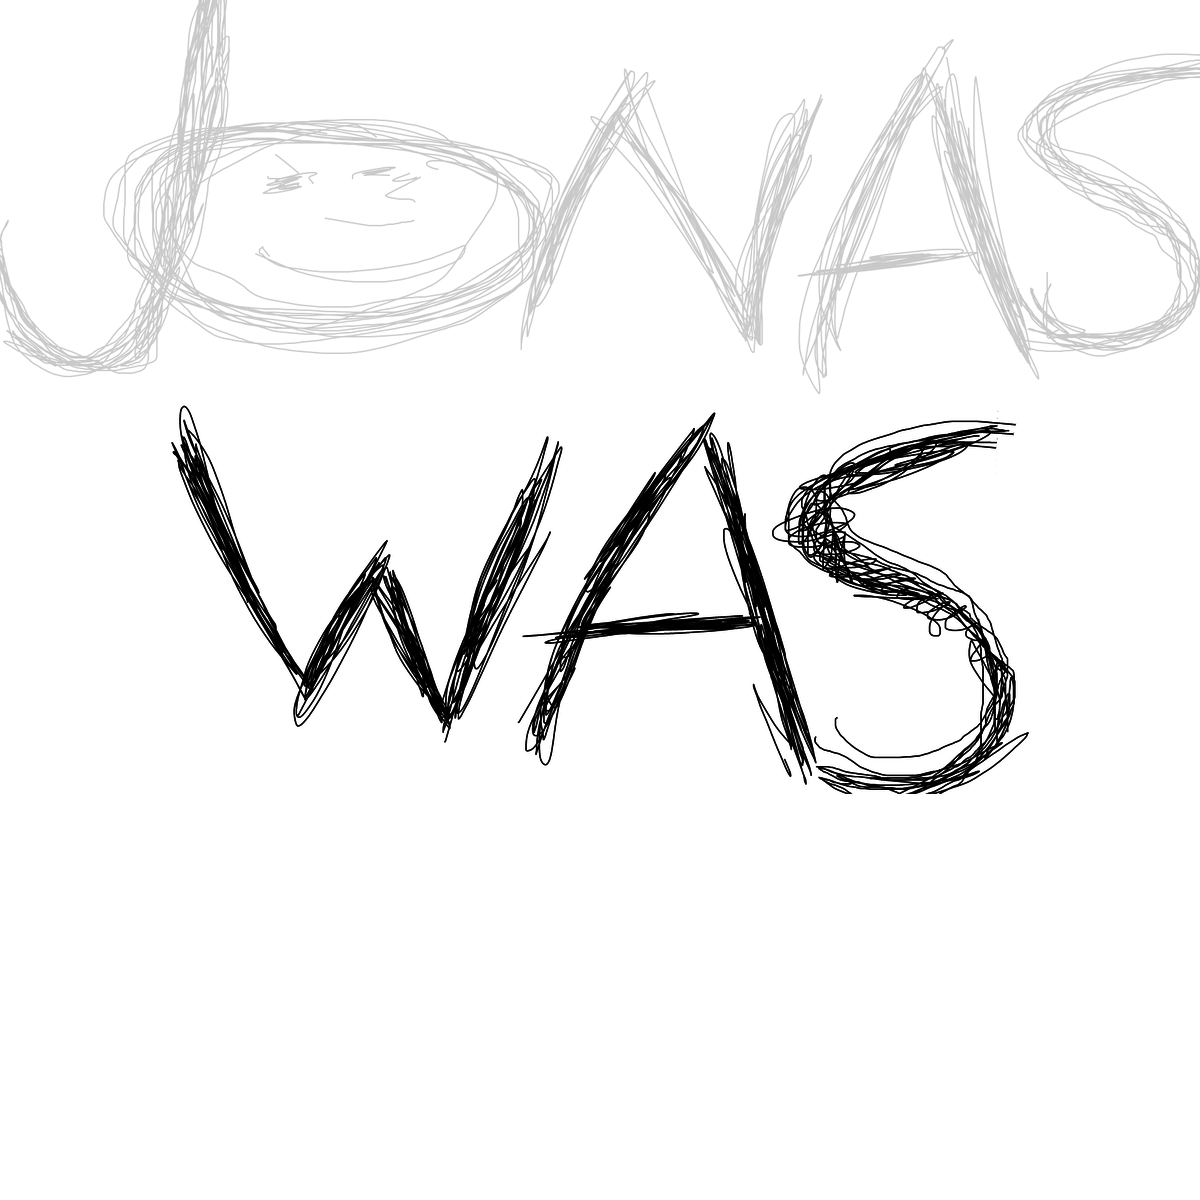 BAAAM drawing#8584 lat:59.9234733581543000lng: 10.7577199935913090